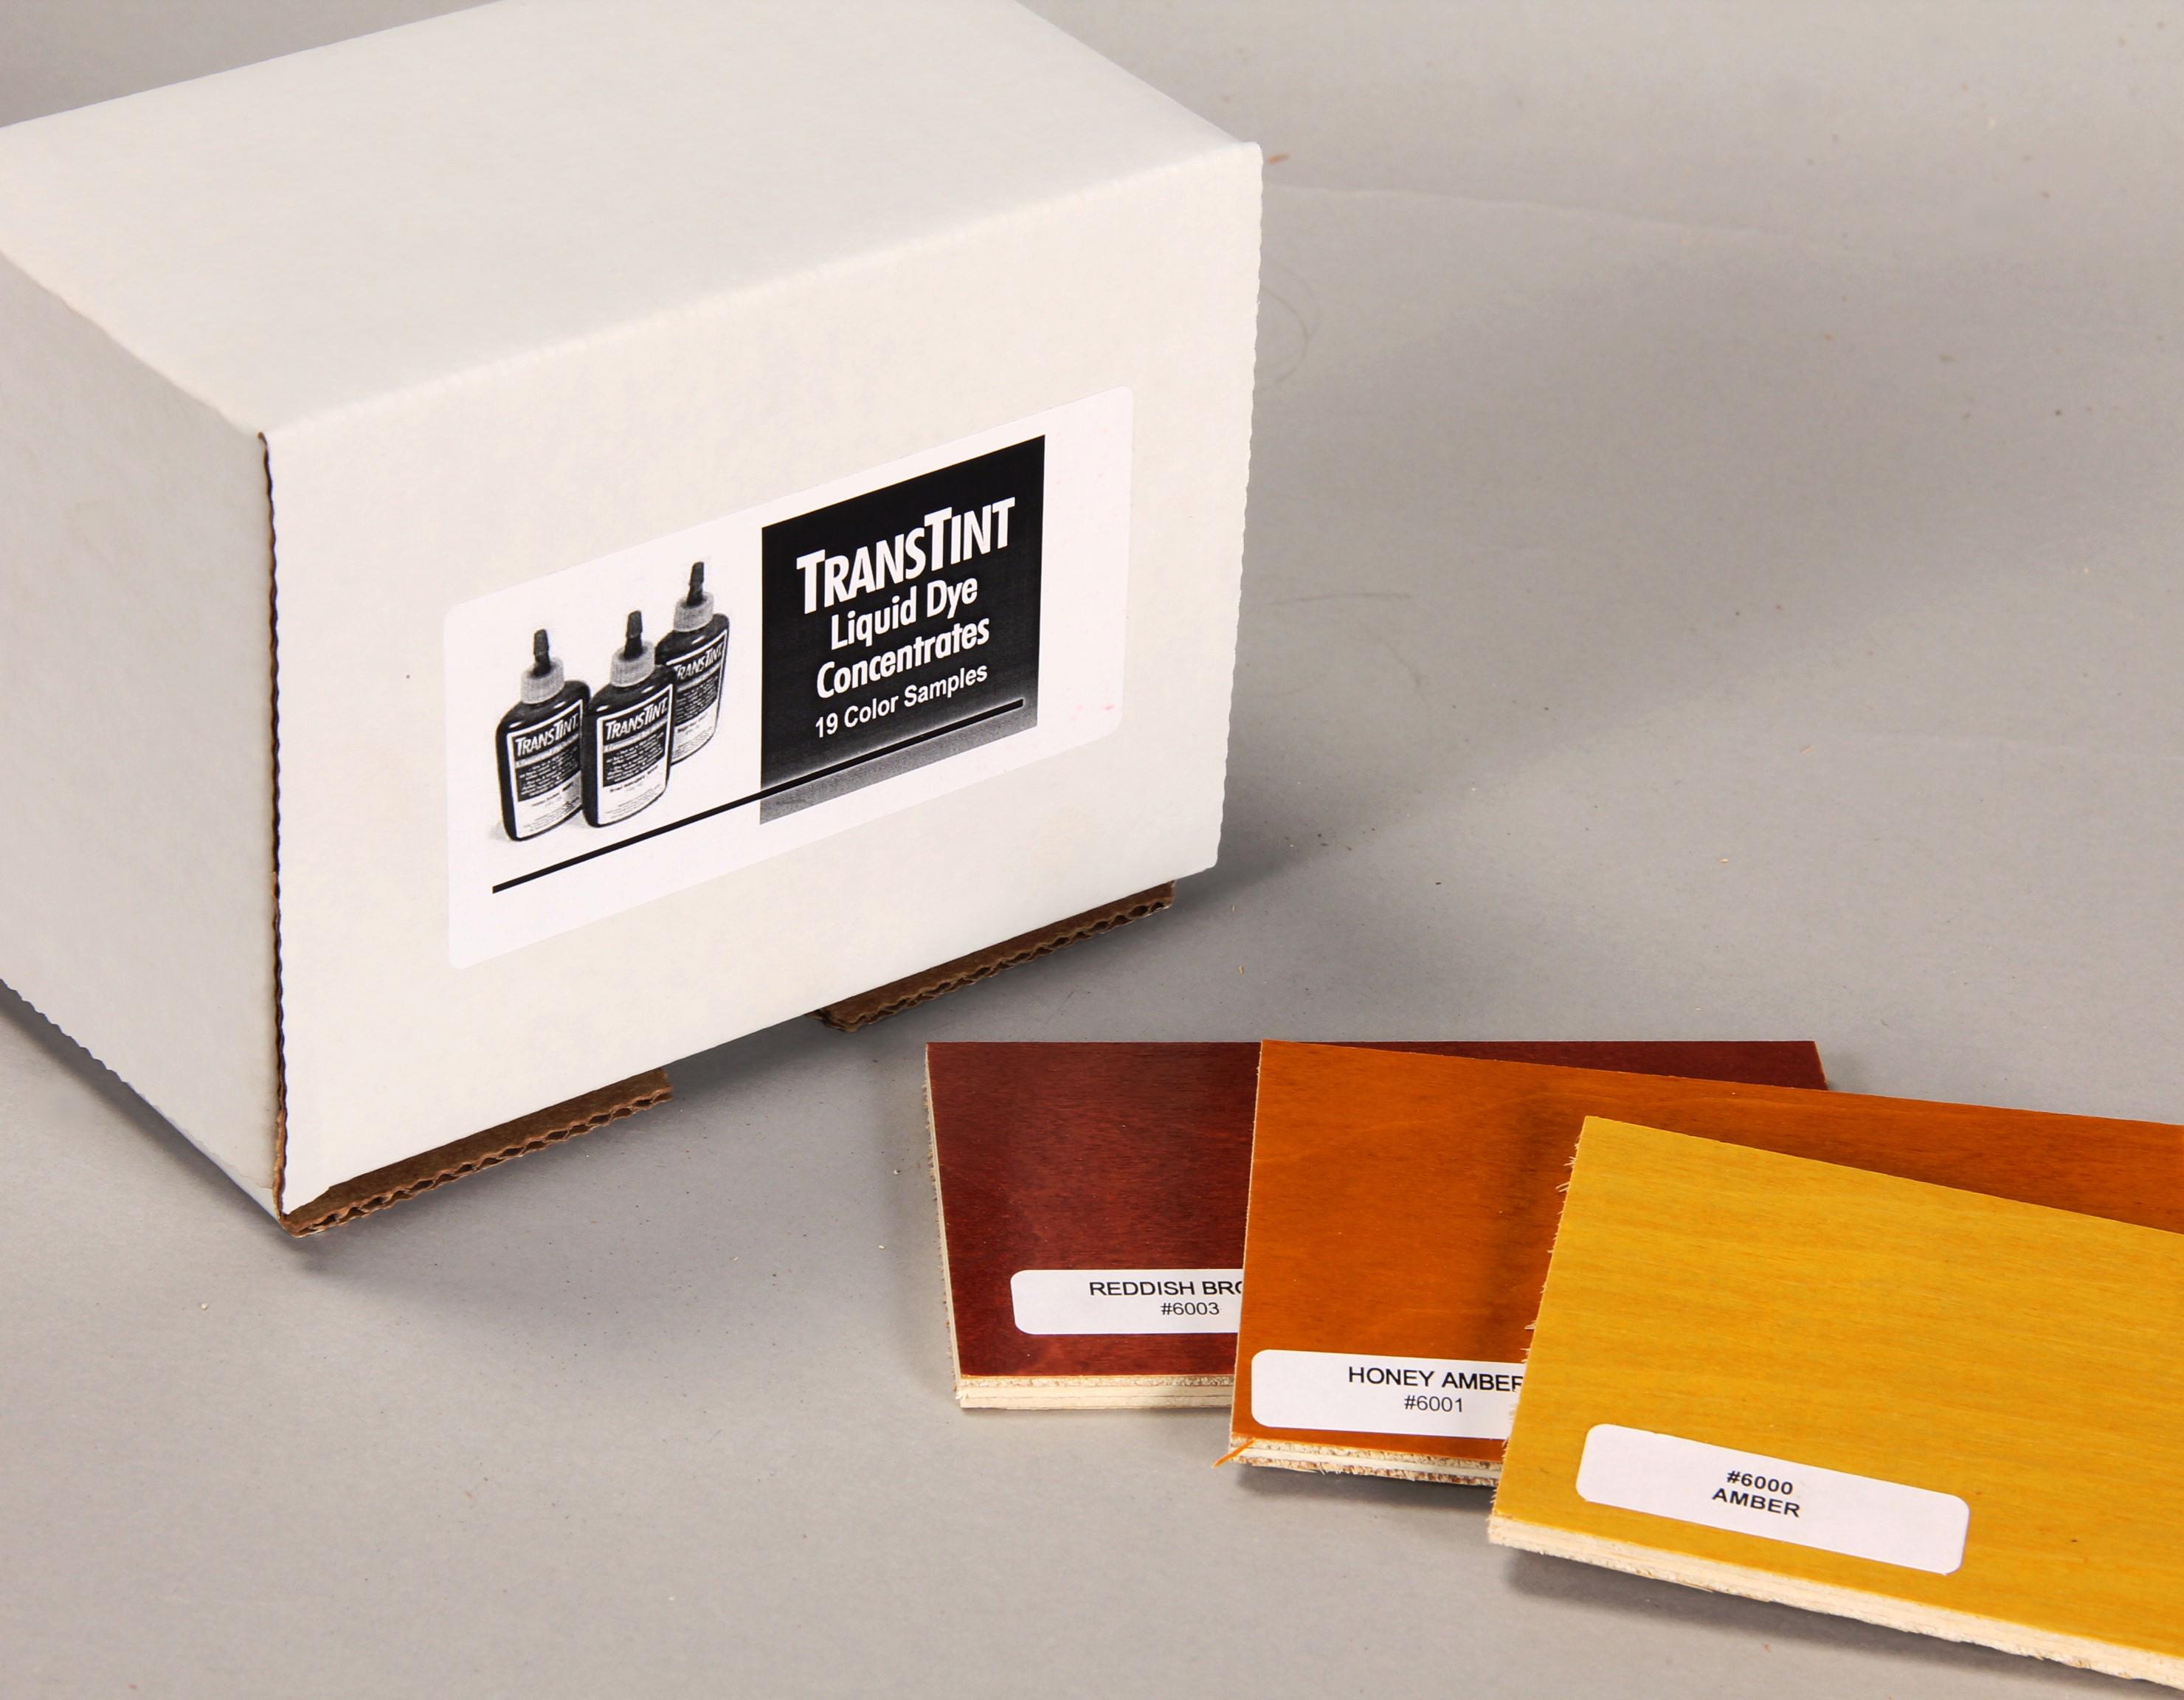 Transtint liquid dyes homestead finishing products